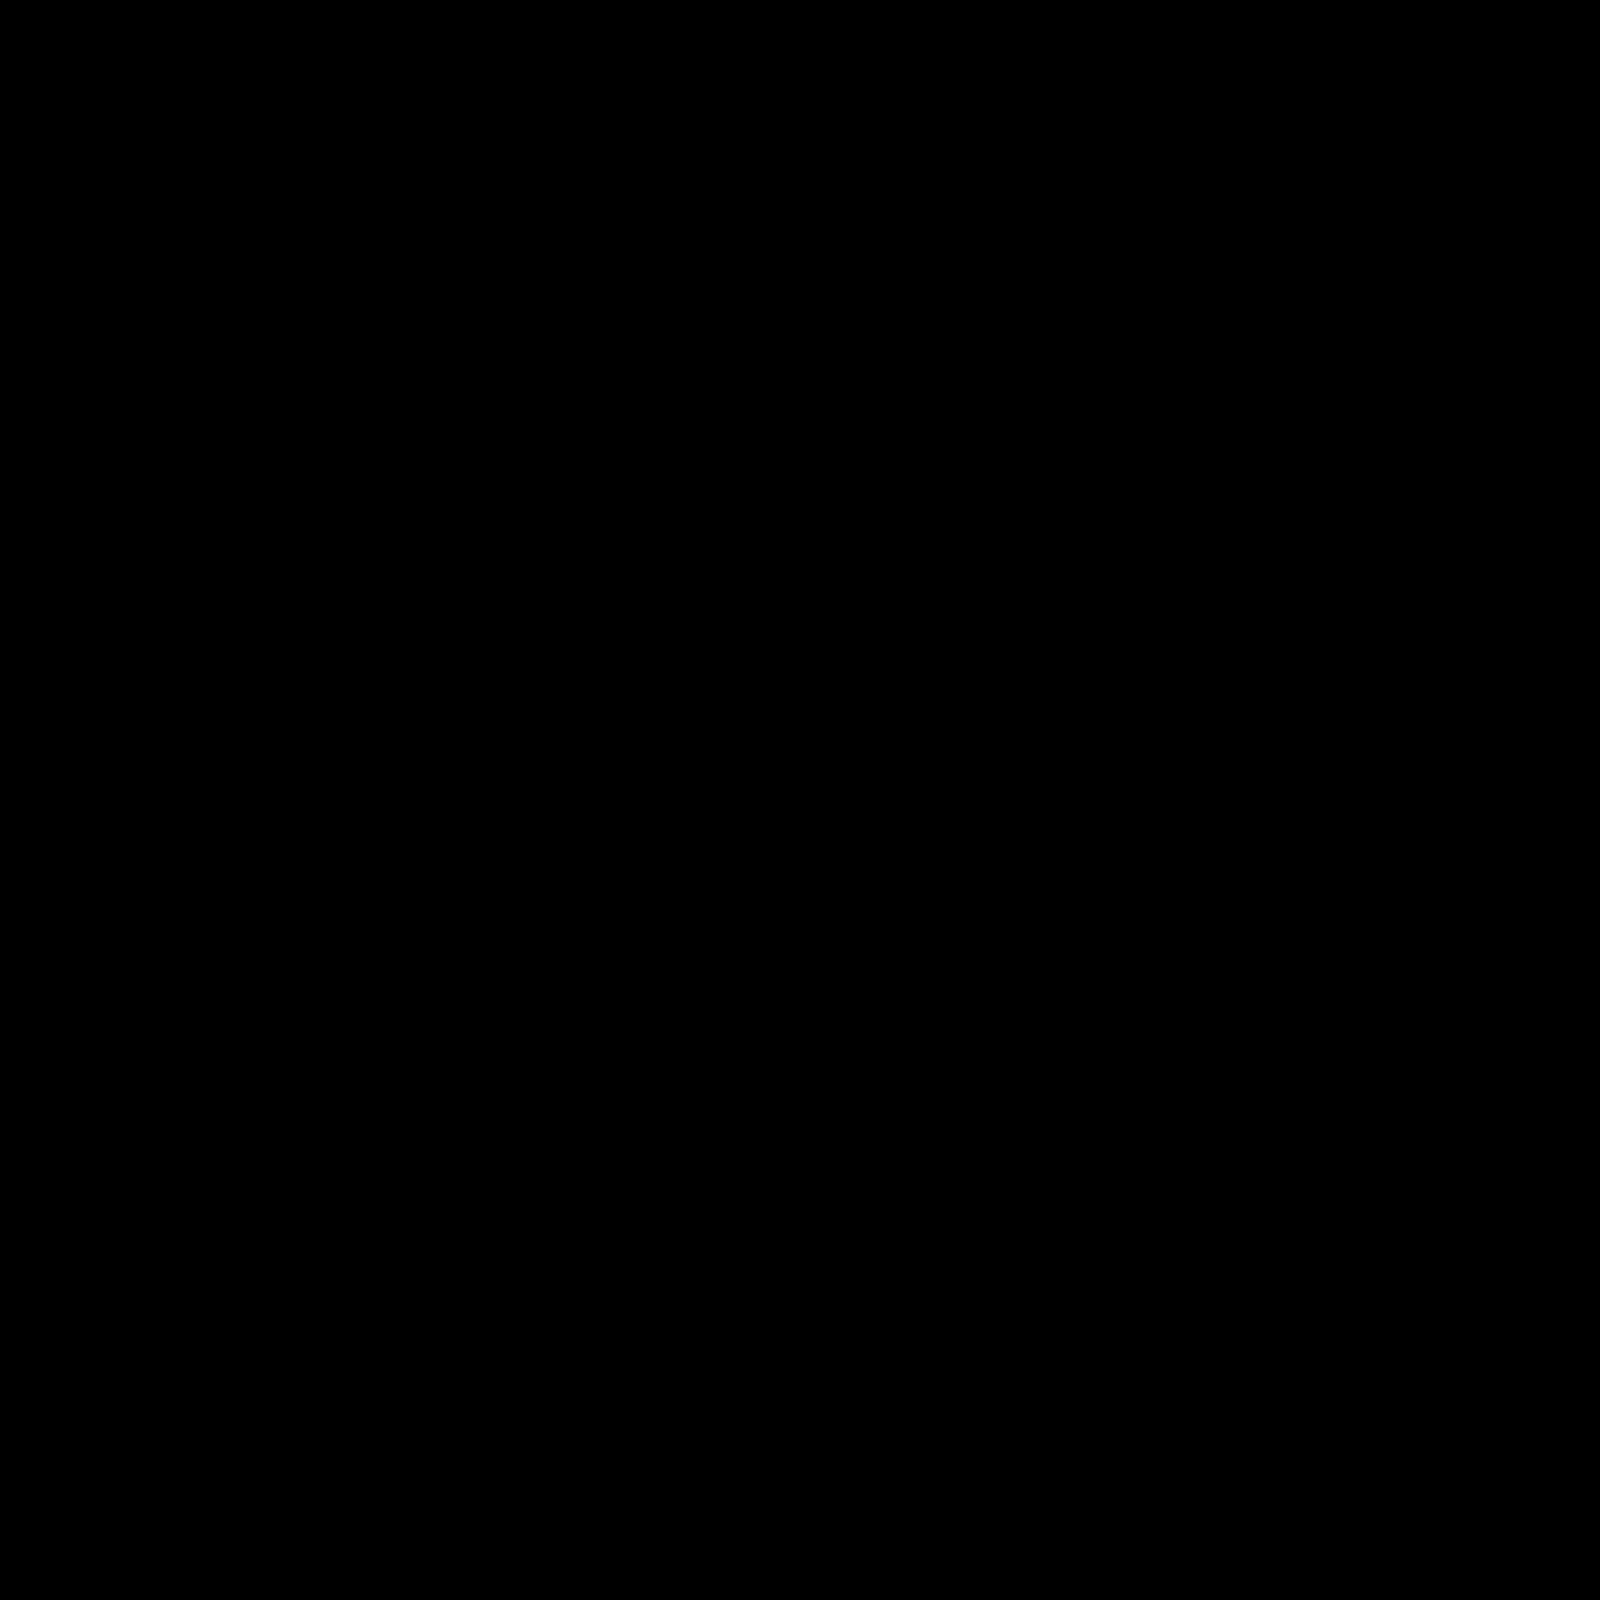 Replicate Rows icon